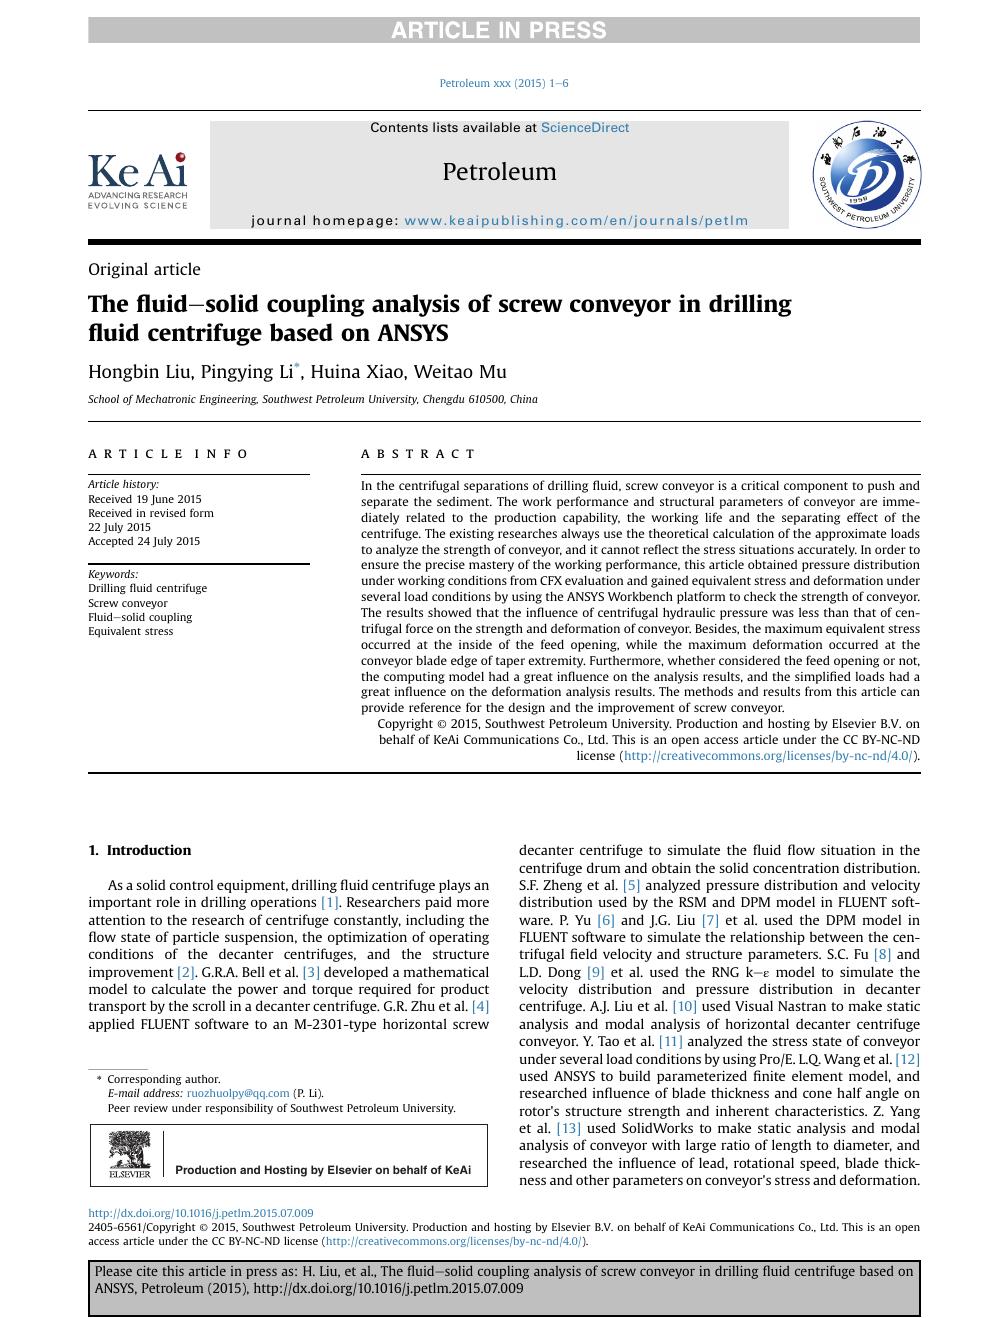 The fluid–solid coupling analysis of screw conveyor in